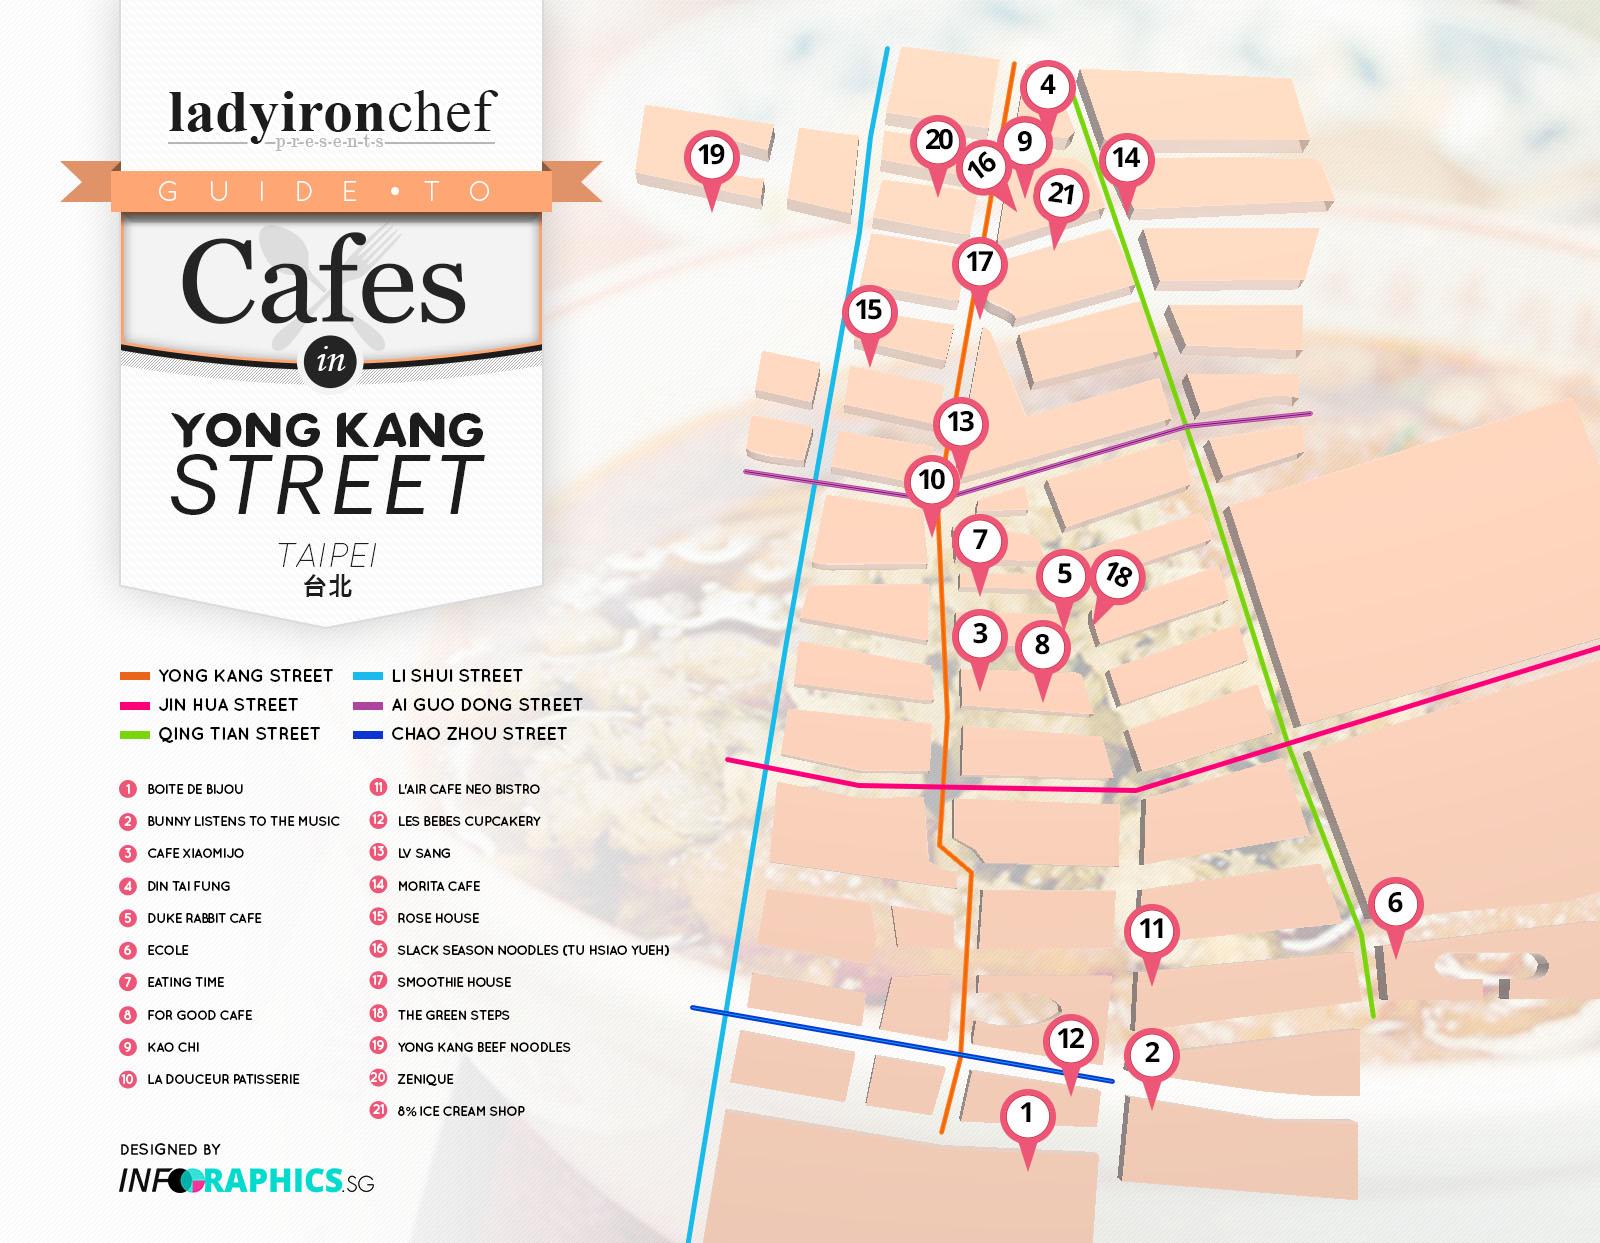 Taipei Yong Kang Guide